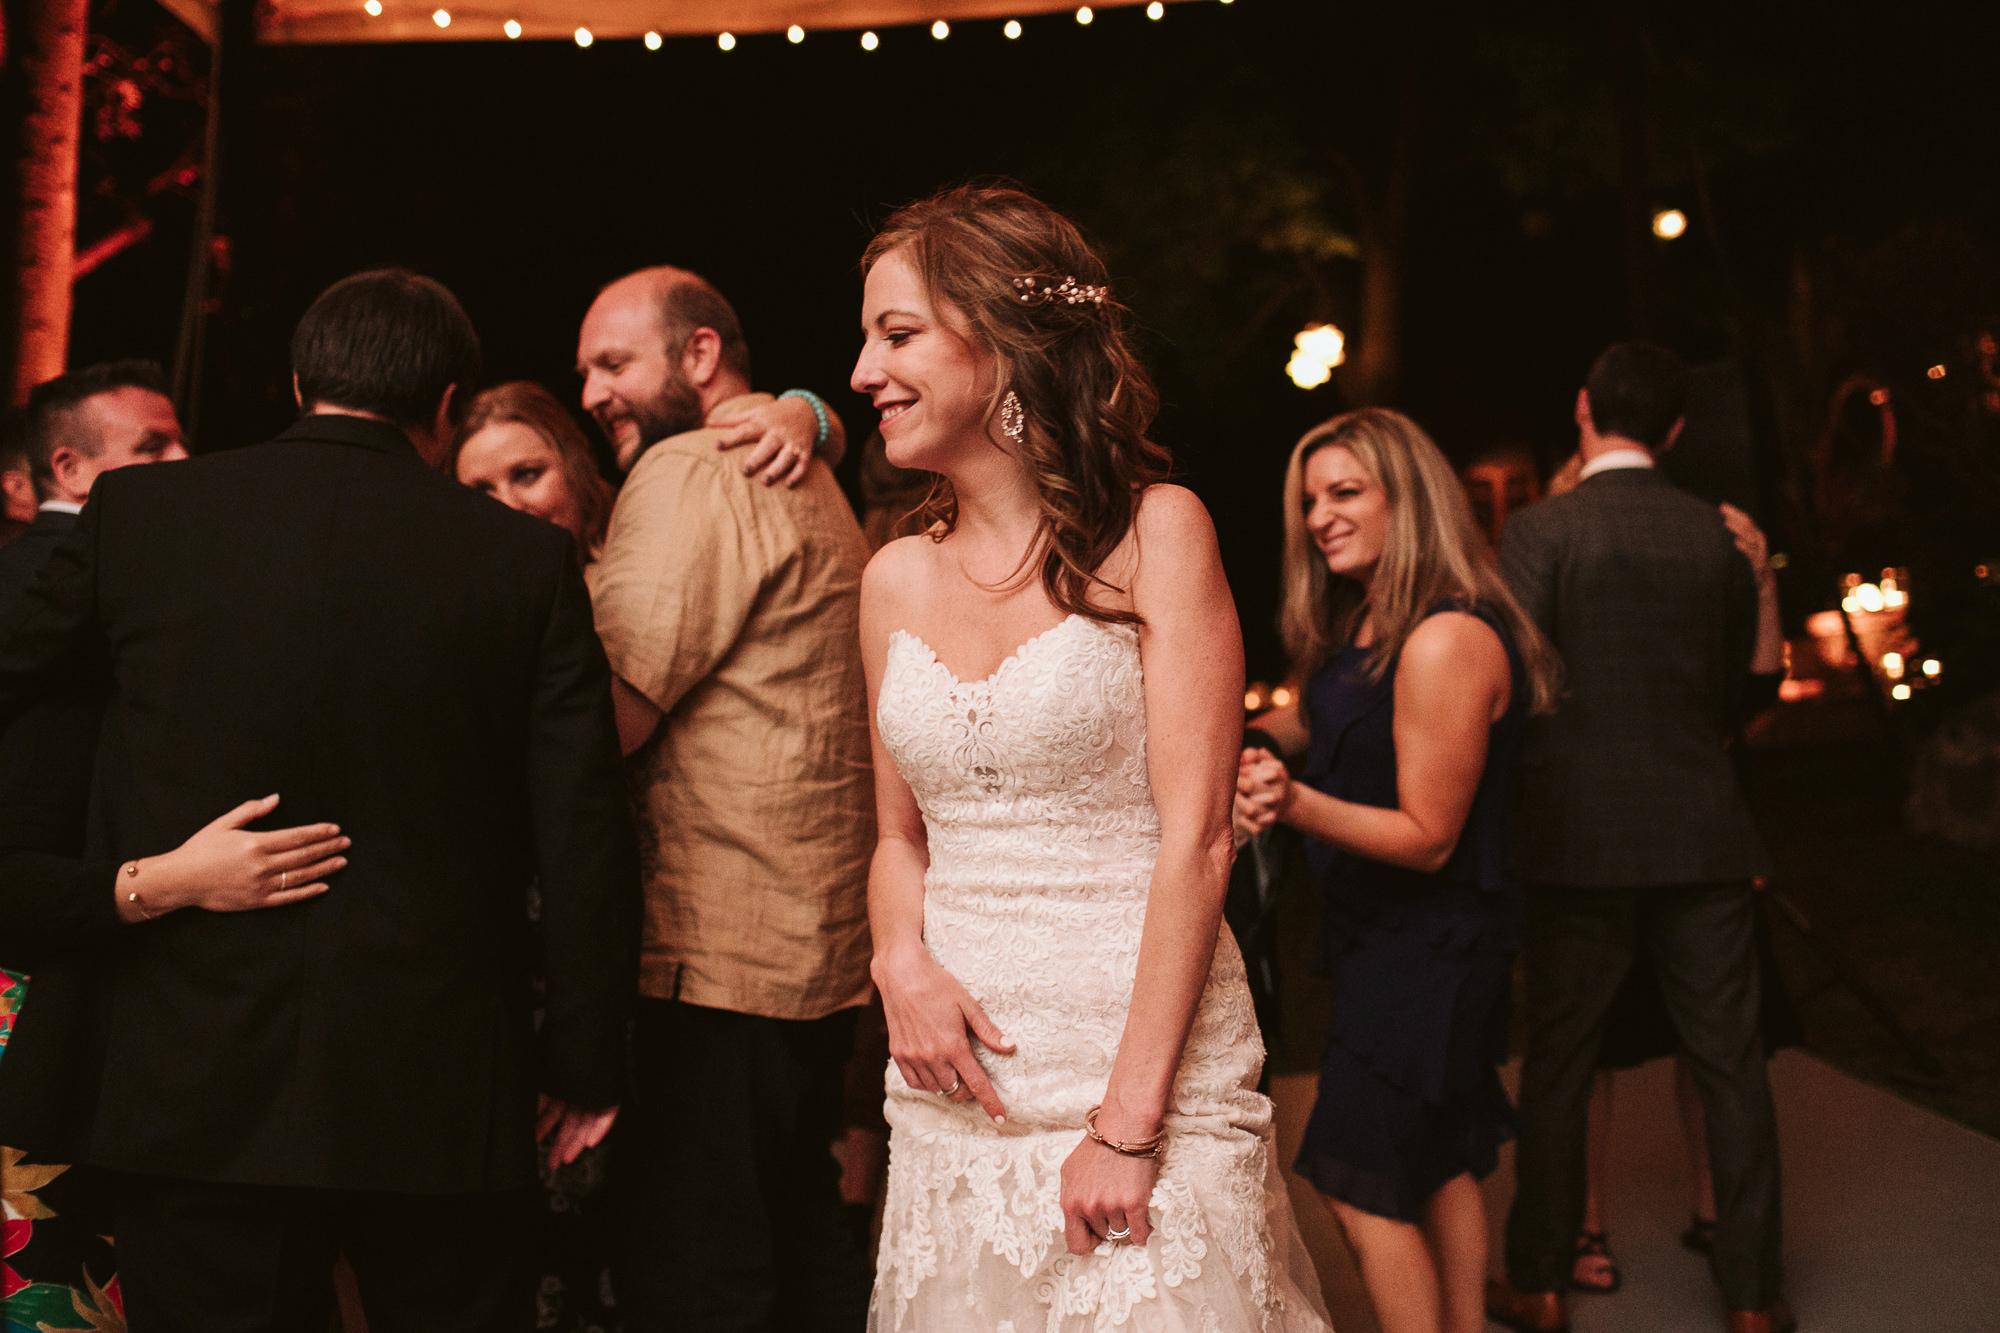 Destination-wedding-photographer-206.jpg